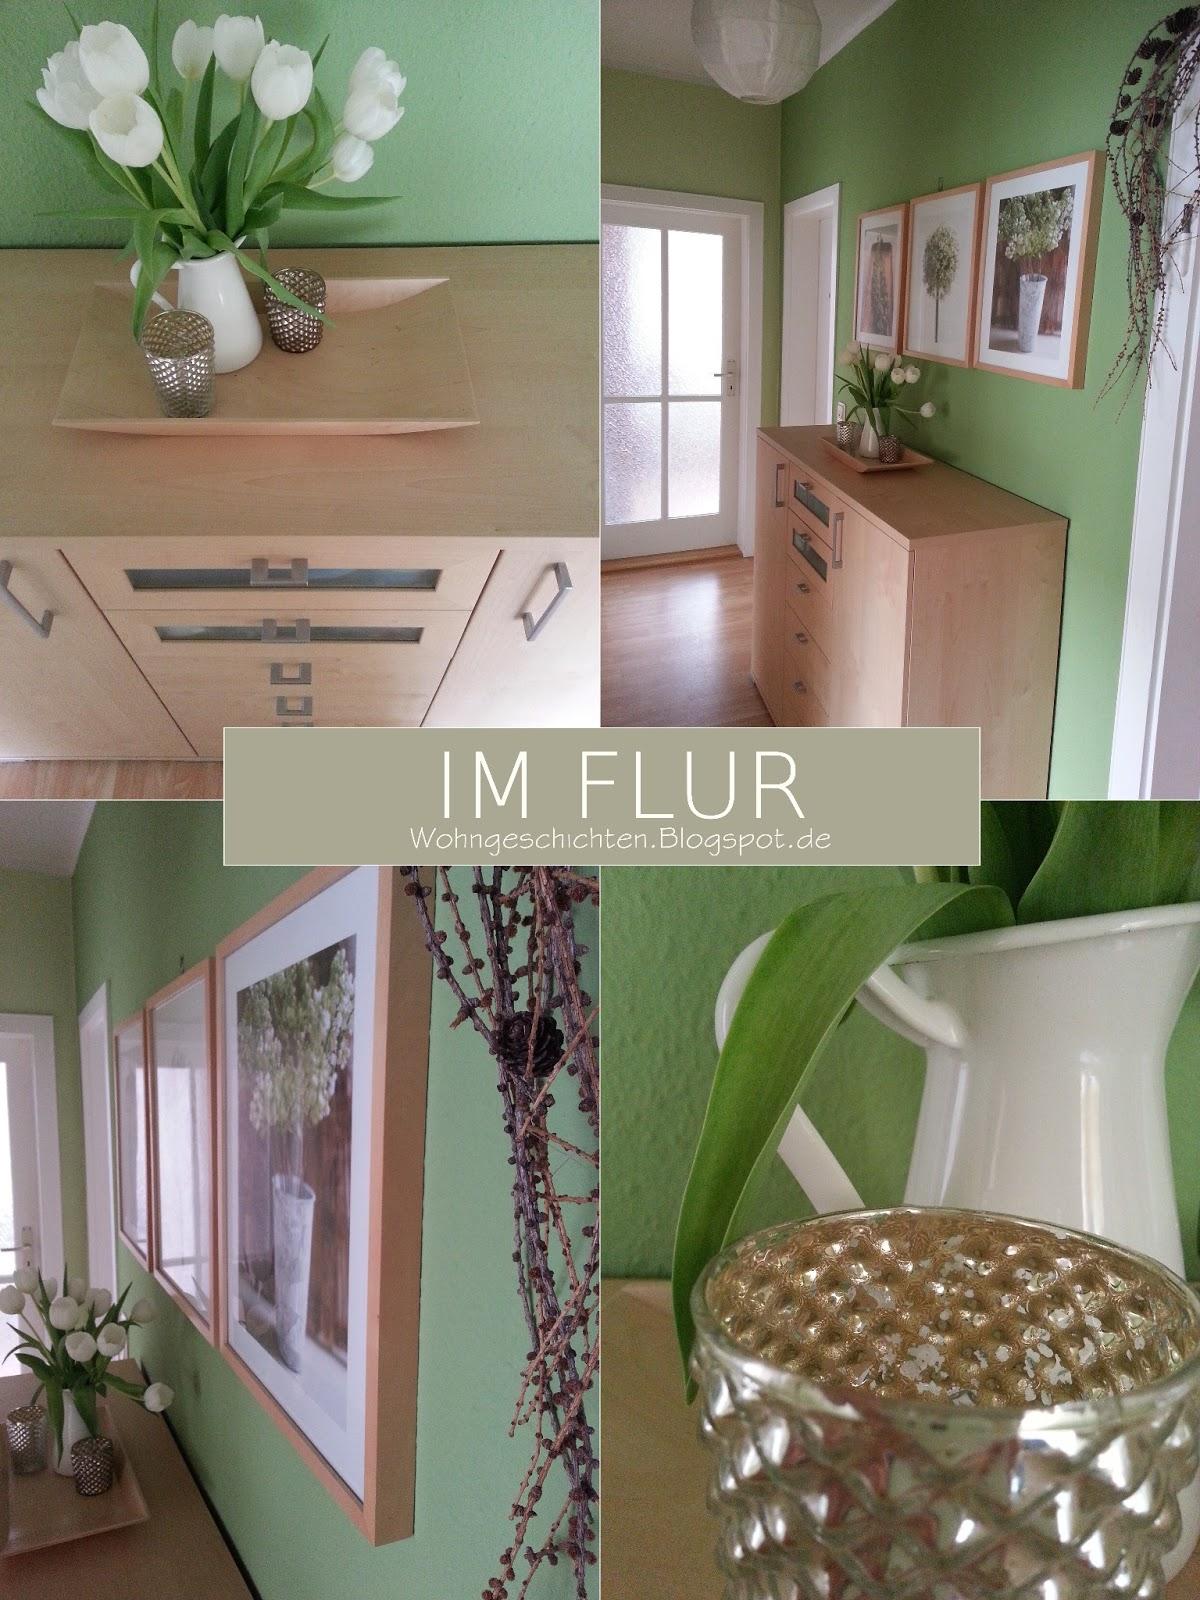 wohngeschichten unser flur oder gr n gr n gr n. Black Bedroom Furniture Sets. Home Design Ideas